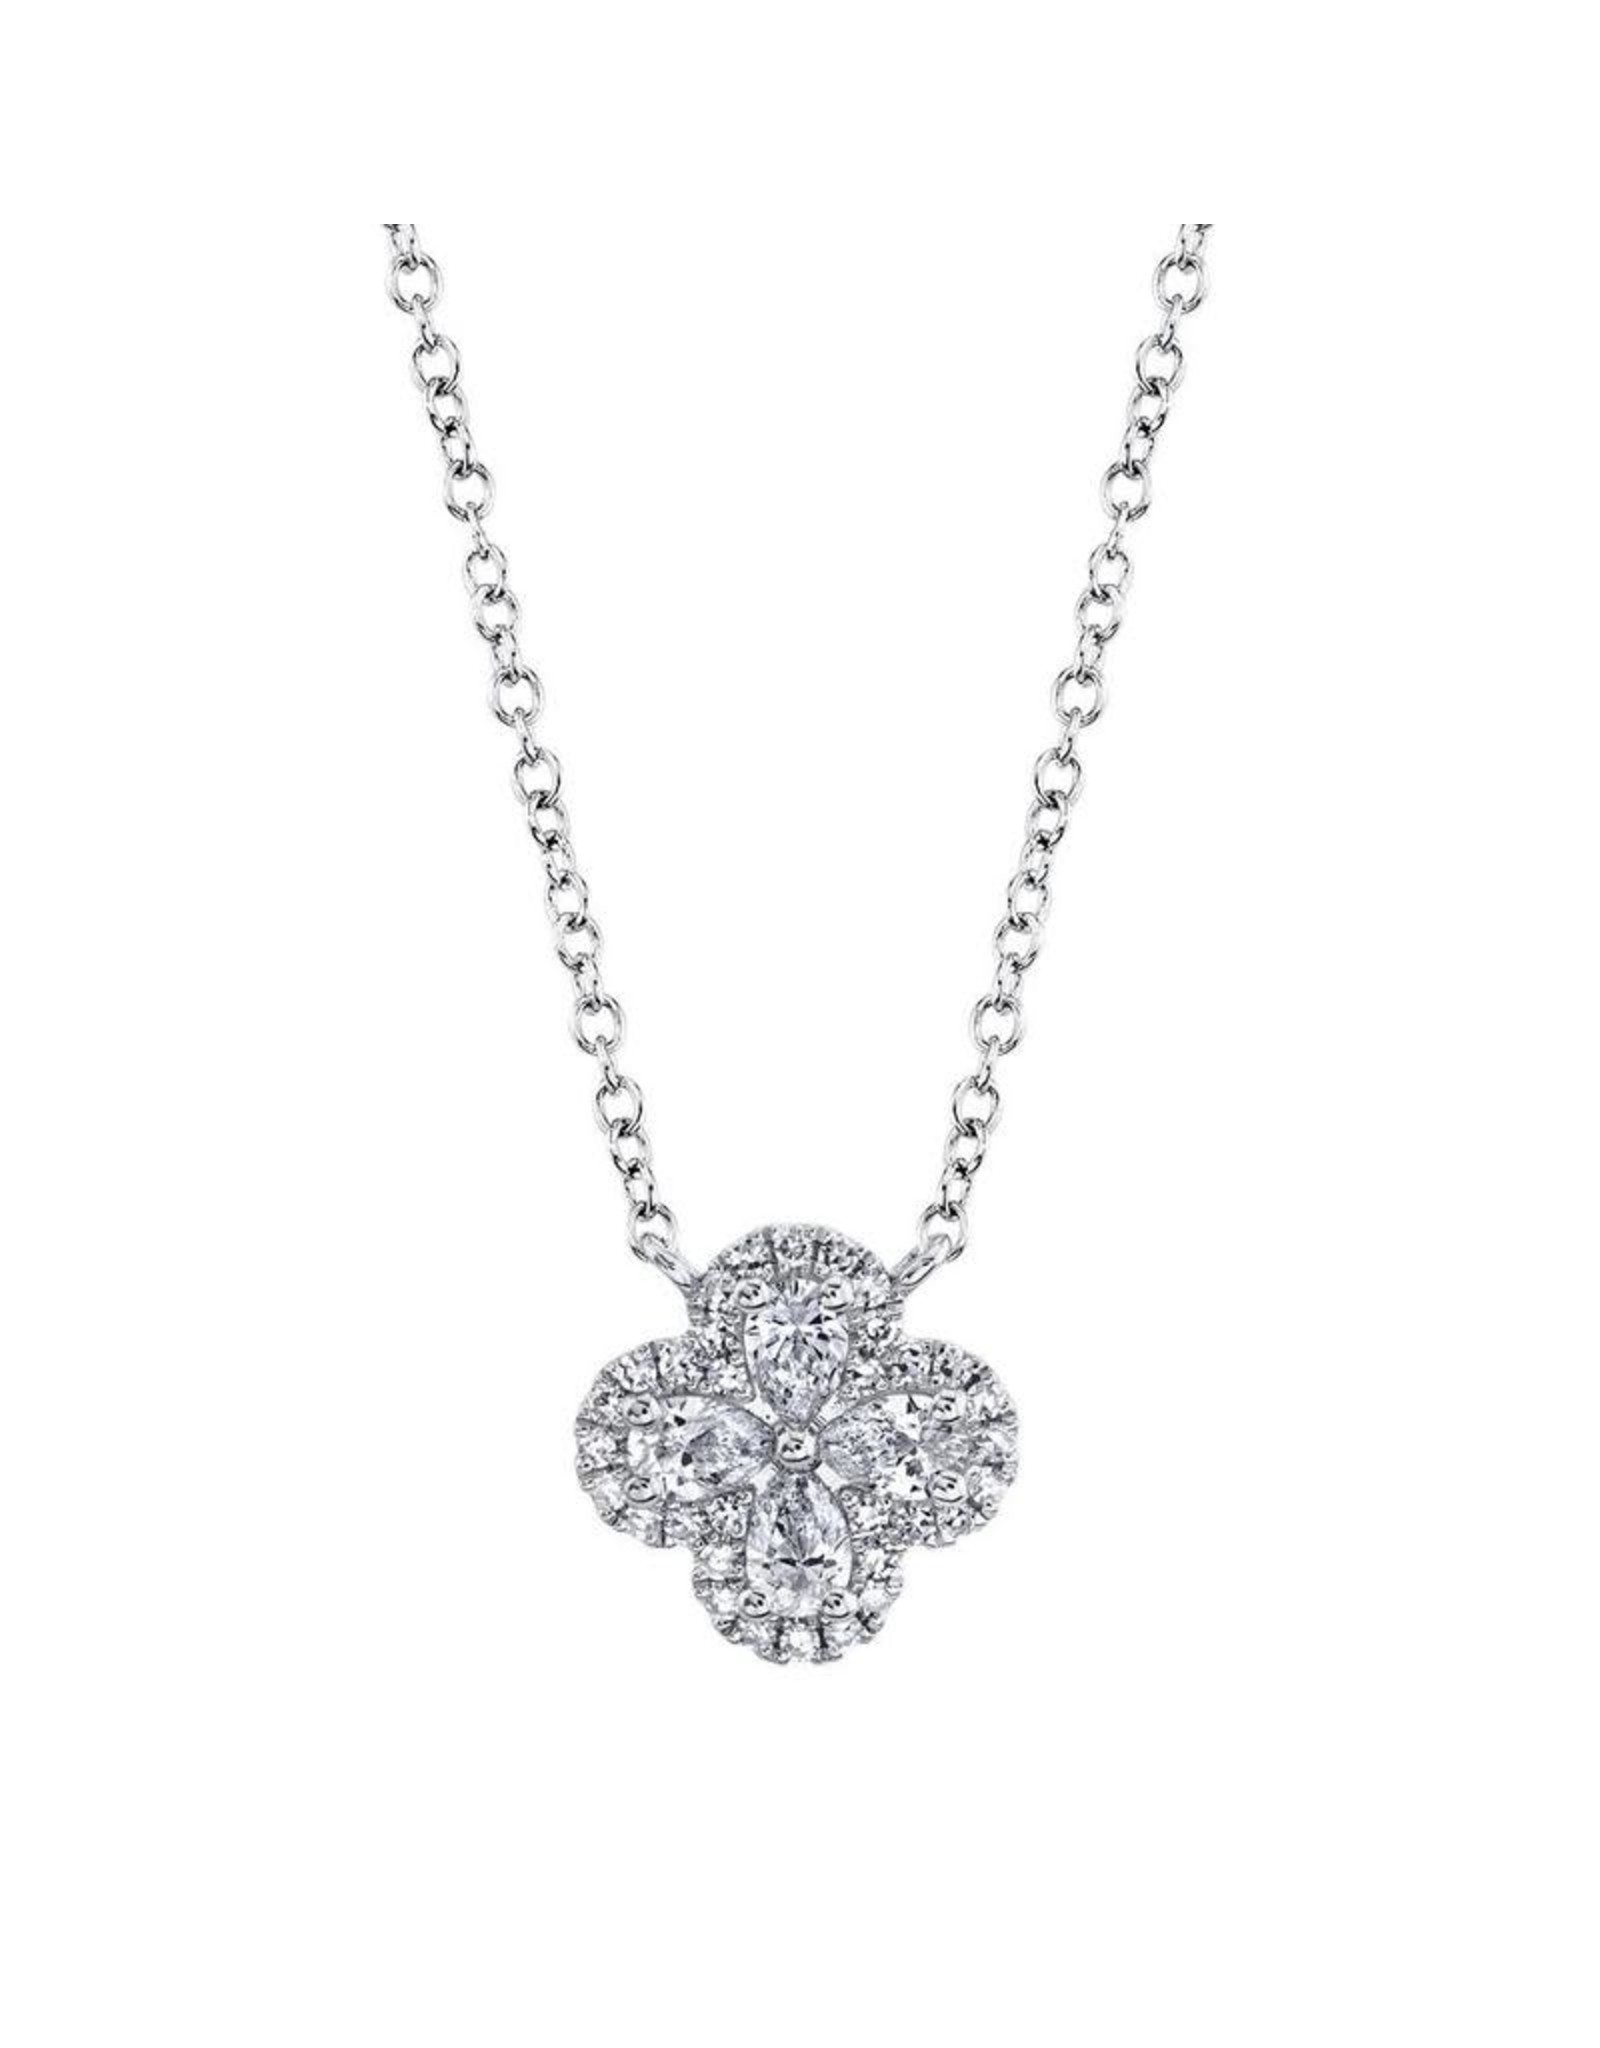 14K White Gold Diamond Clover Necklace, D: 0.41ct